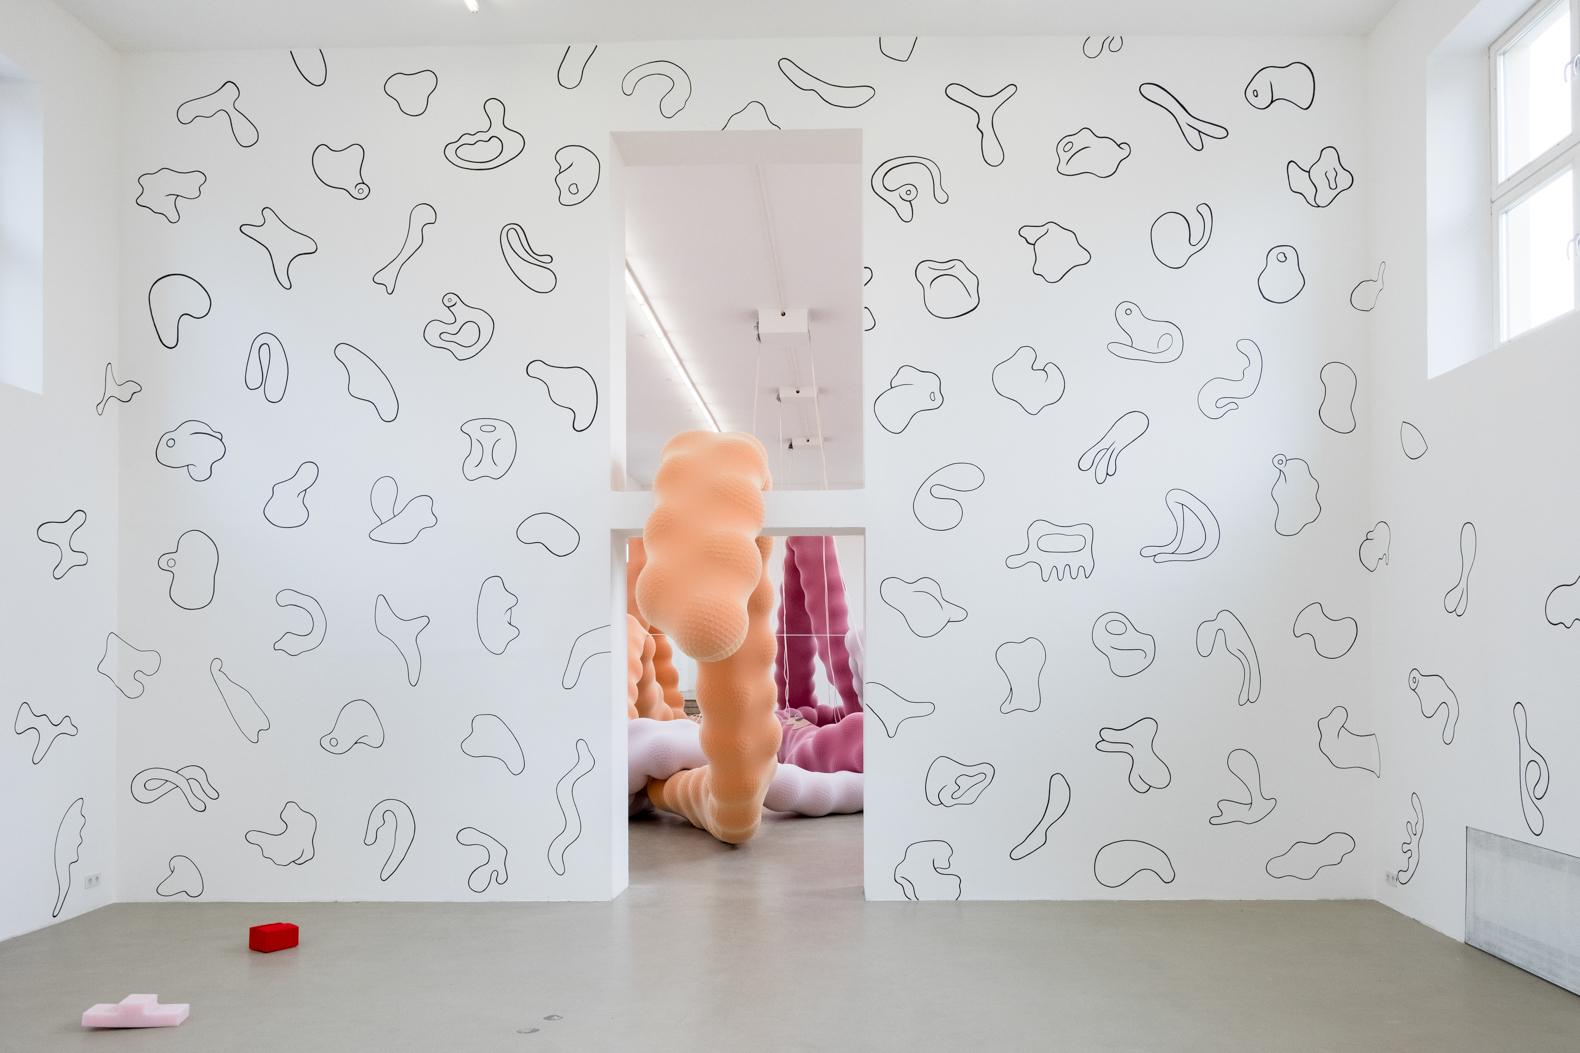 Eva Fàbregas, Those things that your fingers can tell, Polifilia,Self-organisingSystem,Kunstverein München, 2019